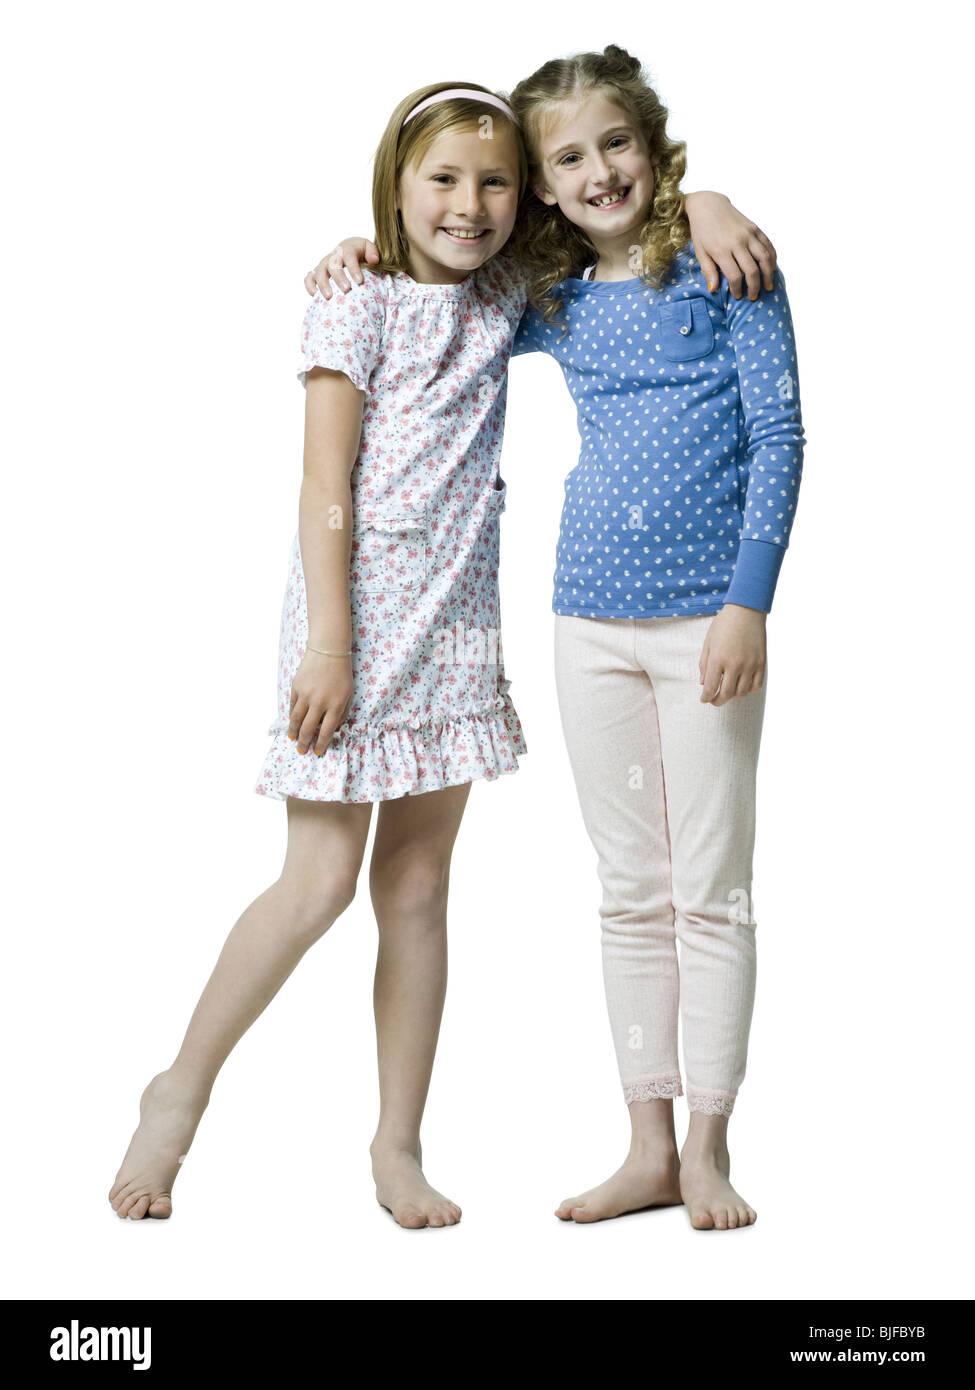 two girls - Stock Image